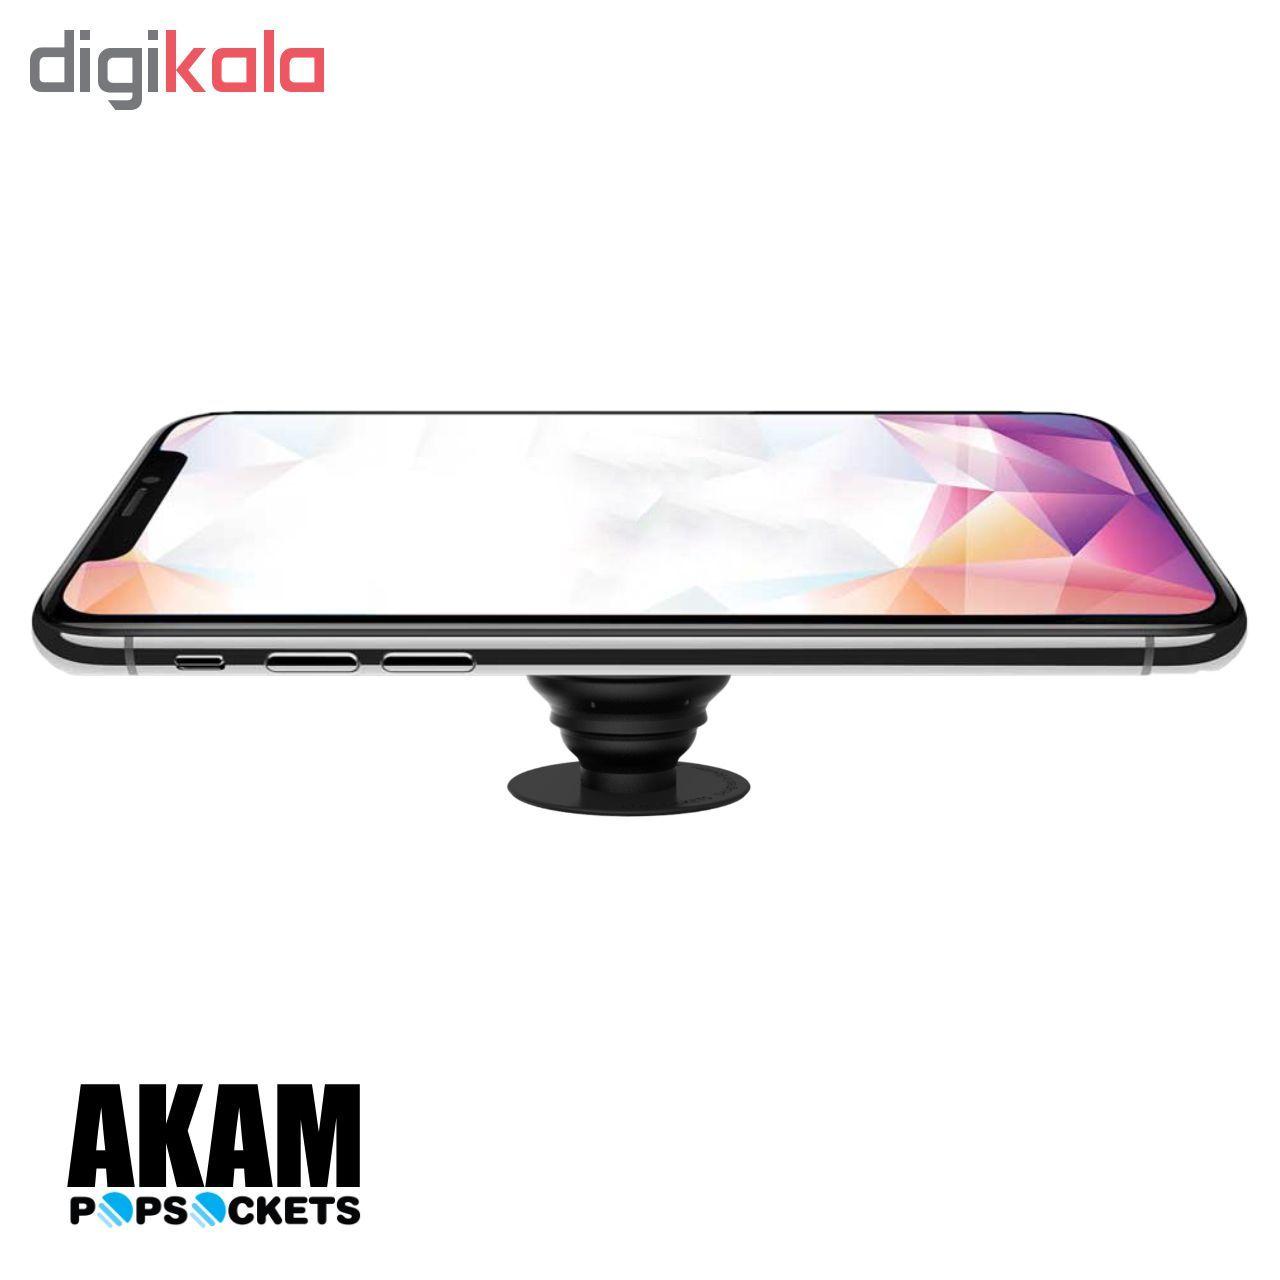 پایه نگهدارنده گوشی موبایل پاپ سوکت آکام مدل APS0163 main 1 9